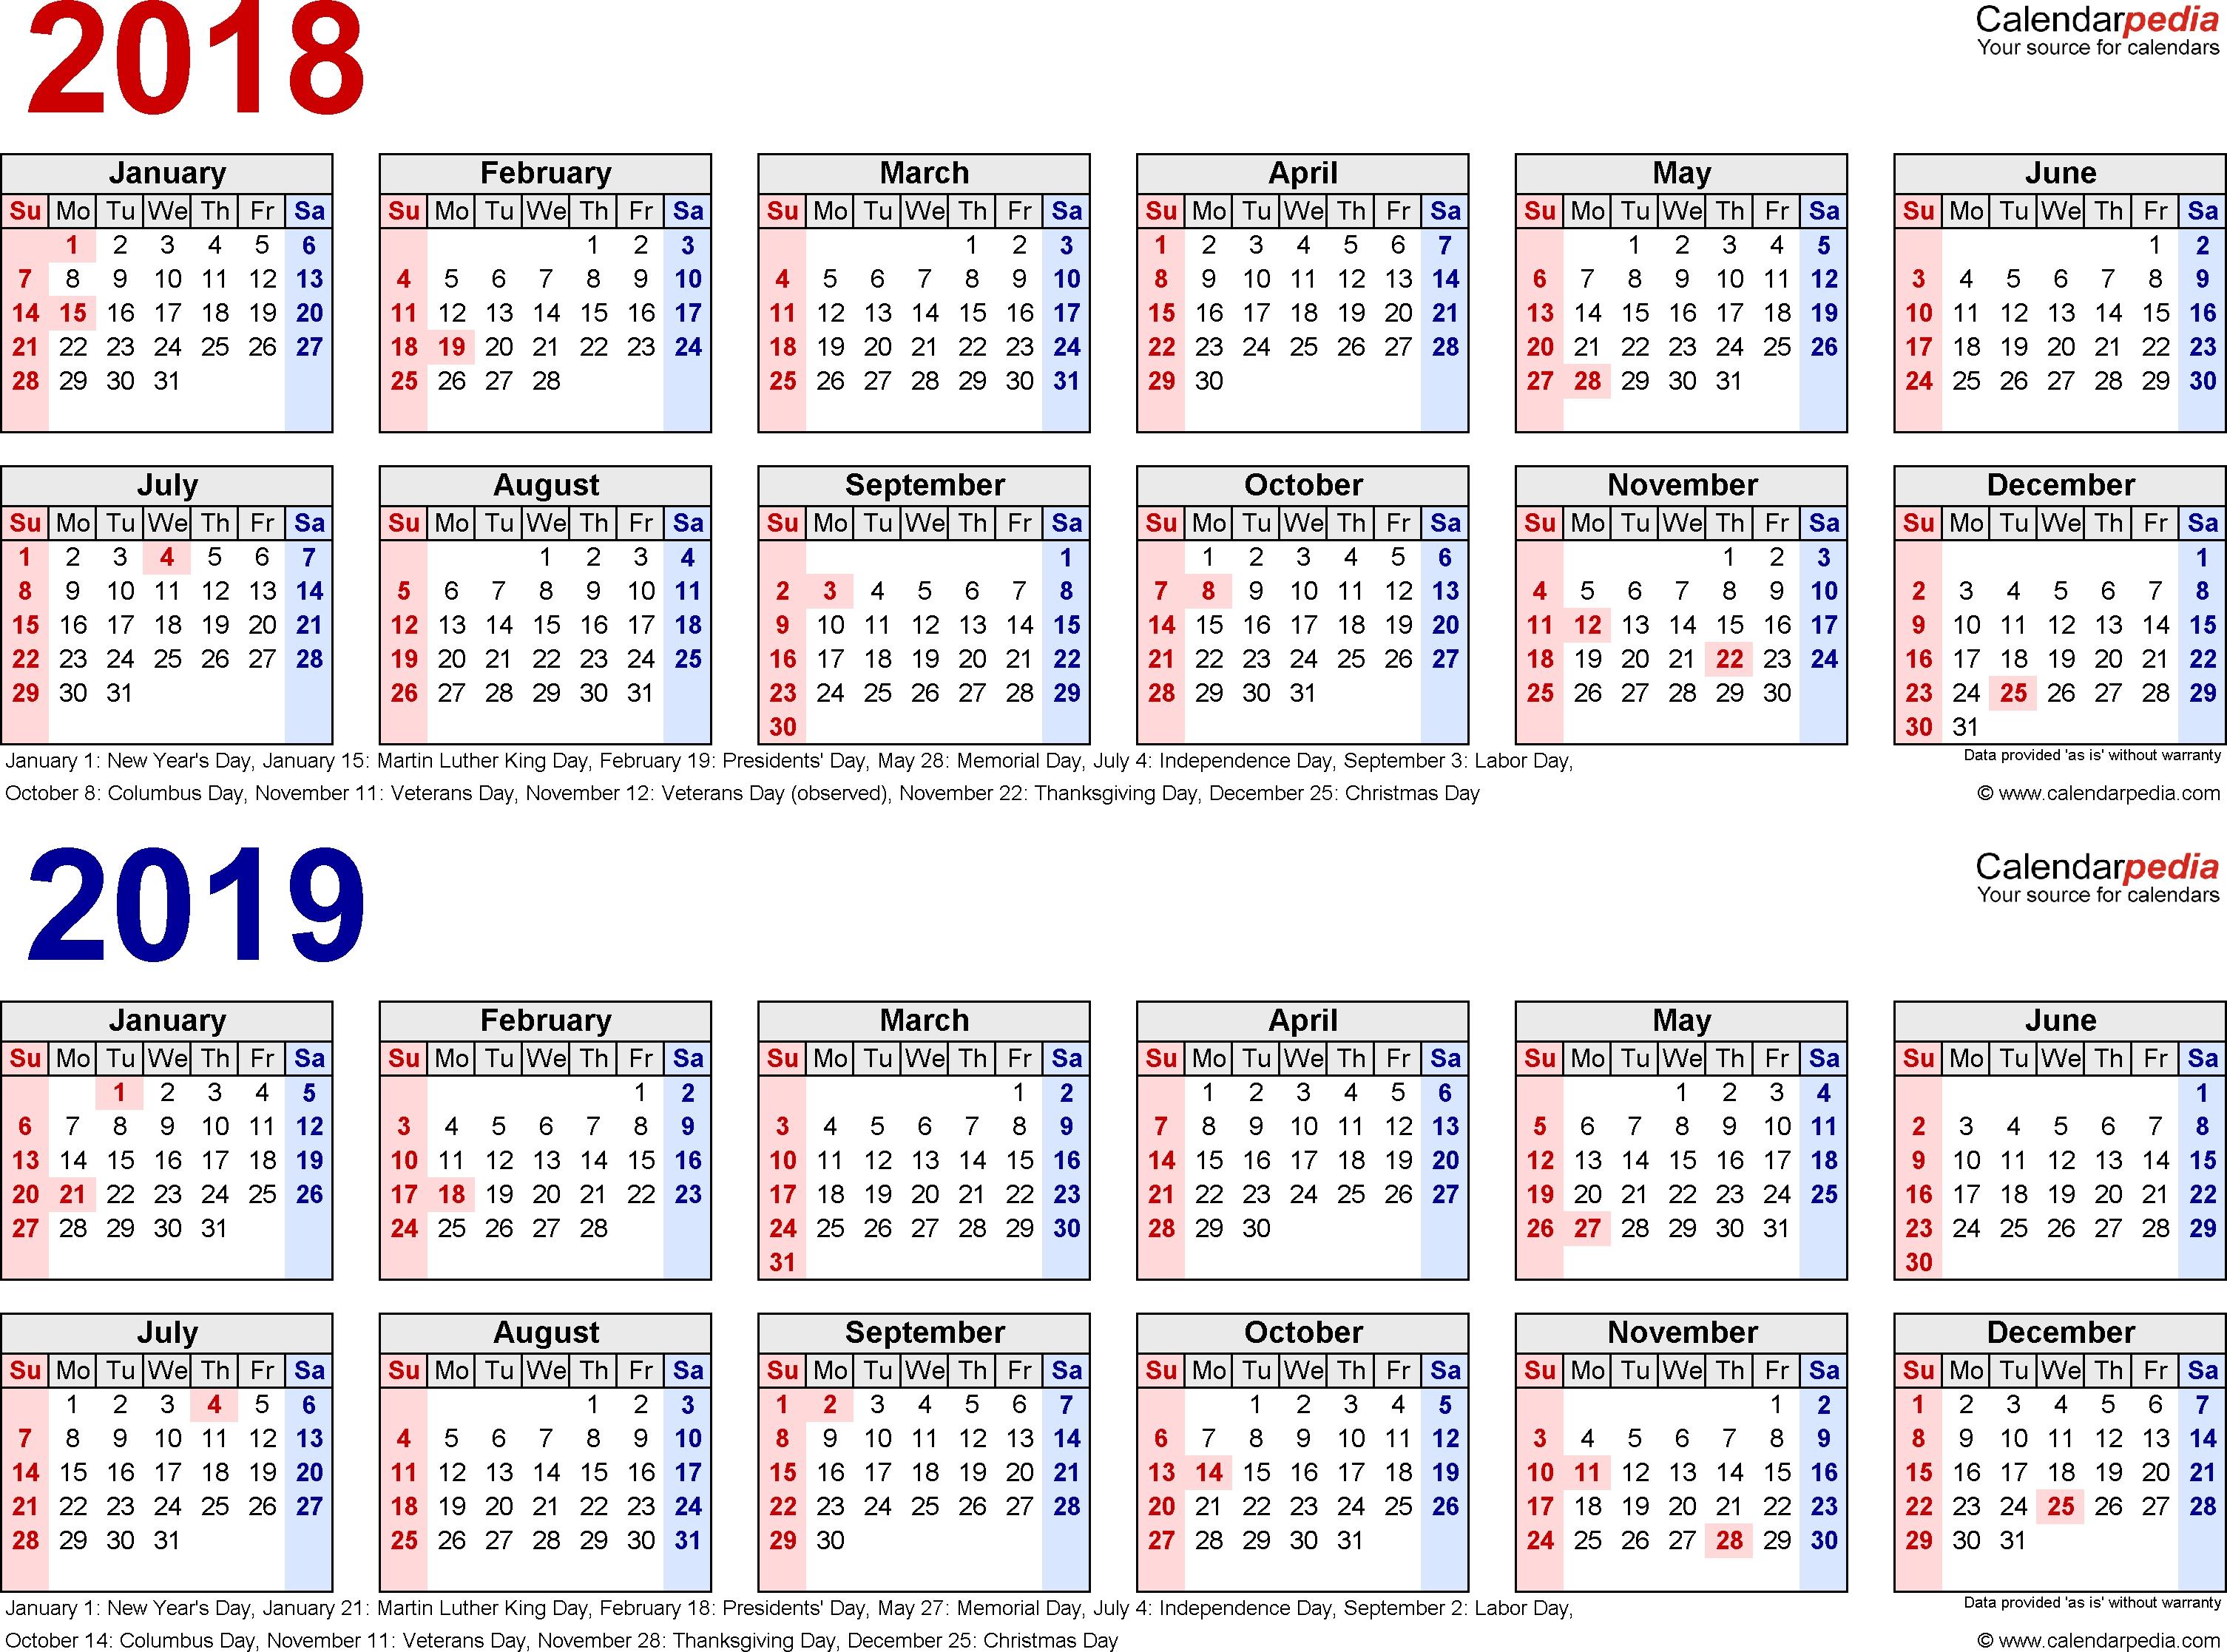 2018 2019 Calendar Free Printable Two Year Pdf Calendars-Monthly Wellness Calendar 2020 Pdf